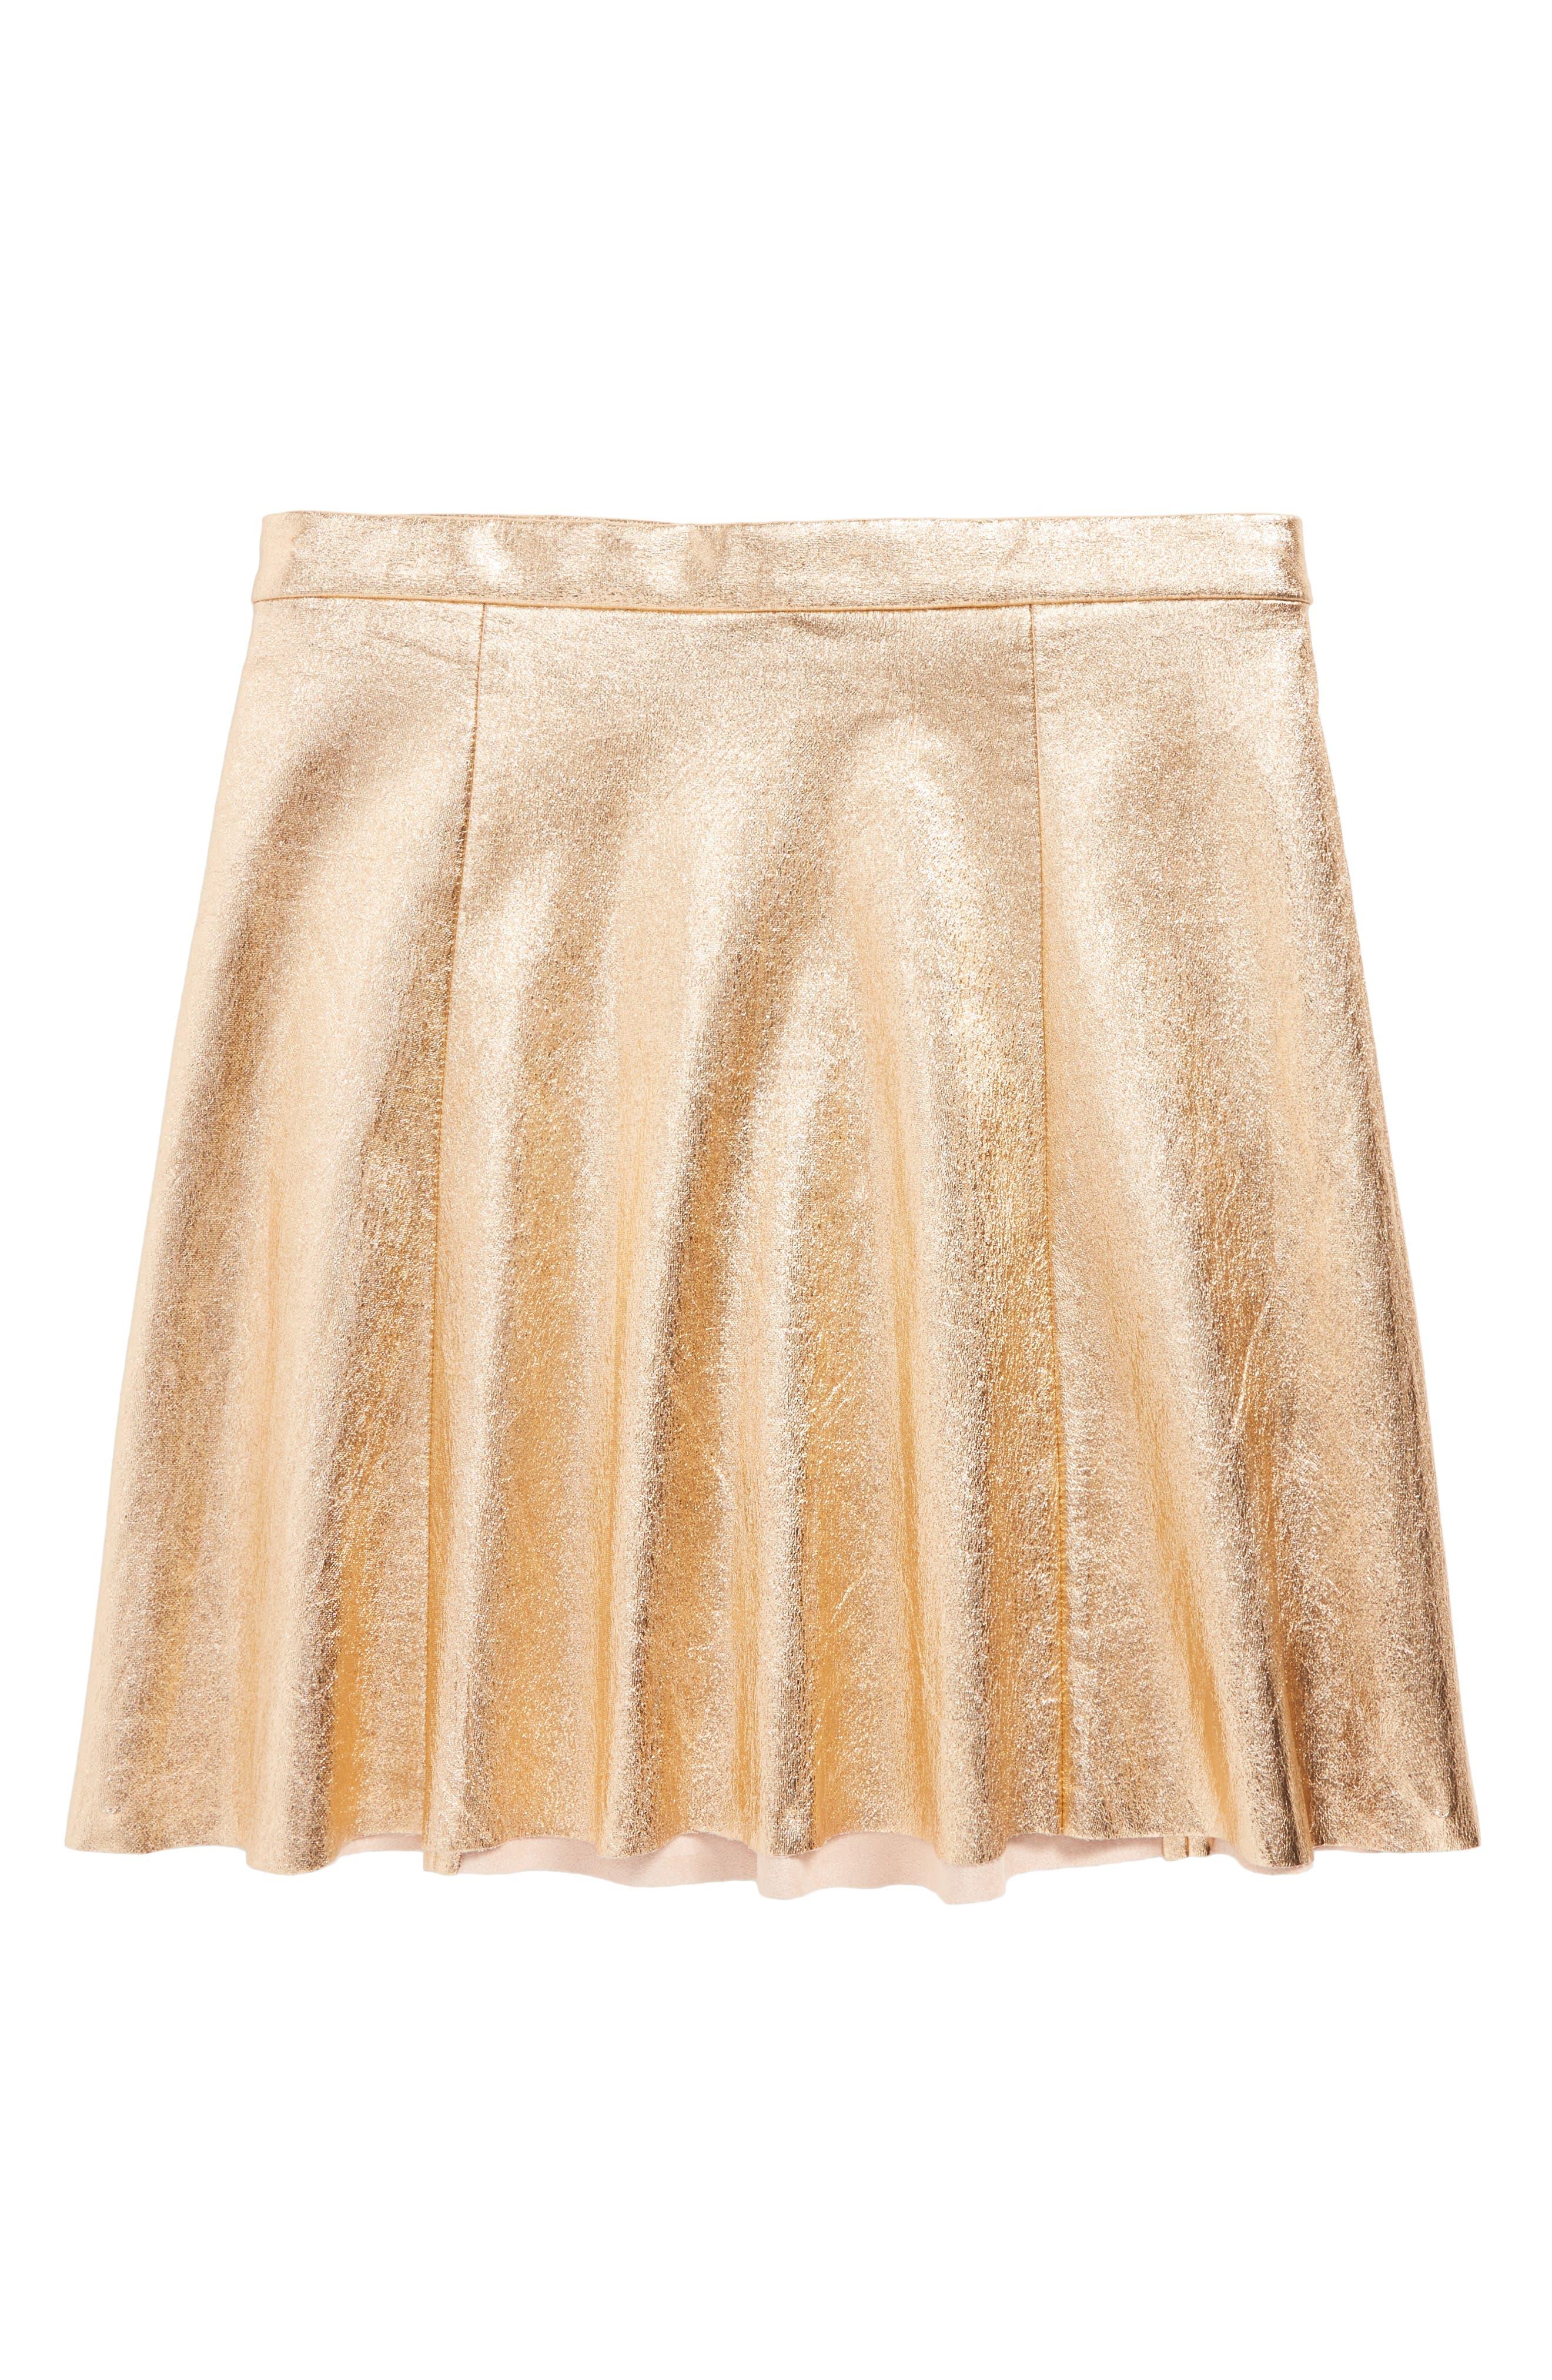 Alternate Image 1 Selected - kate spade new york metallic skirt (Big Girls)